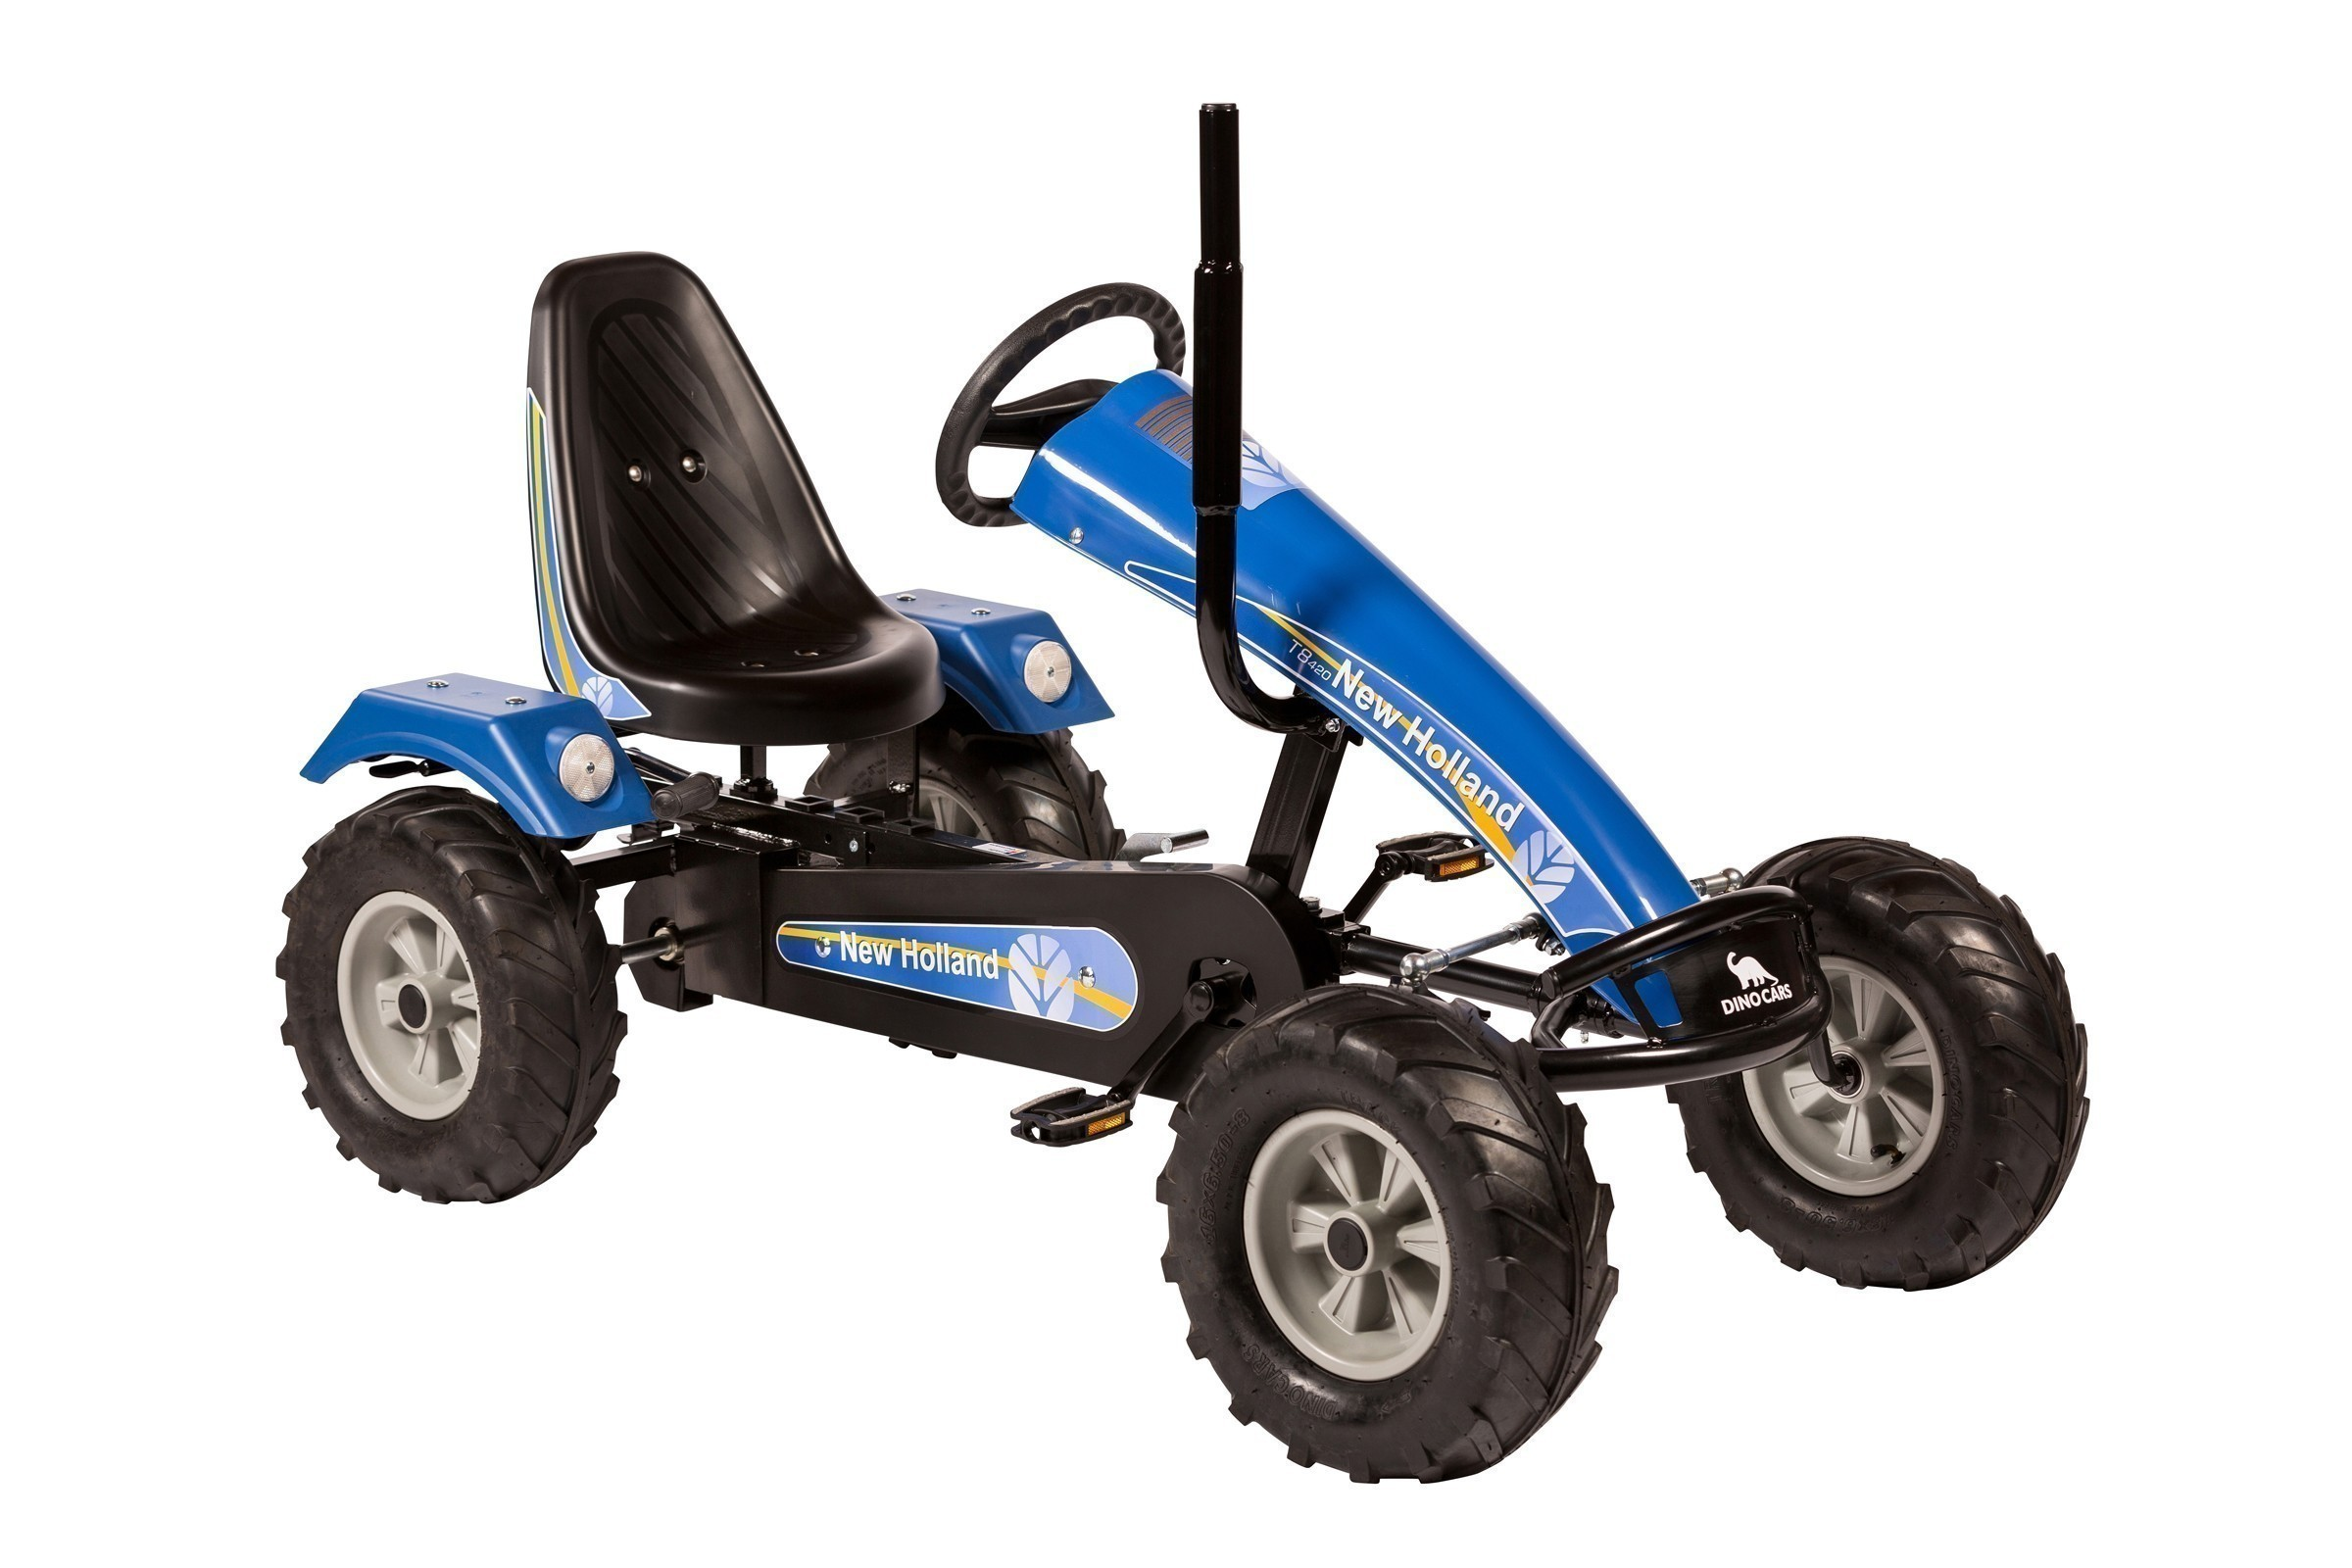 Gokart / Pedal-Gokart Track BF3 New Holland blau DINO CARS Bild 1